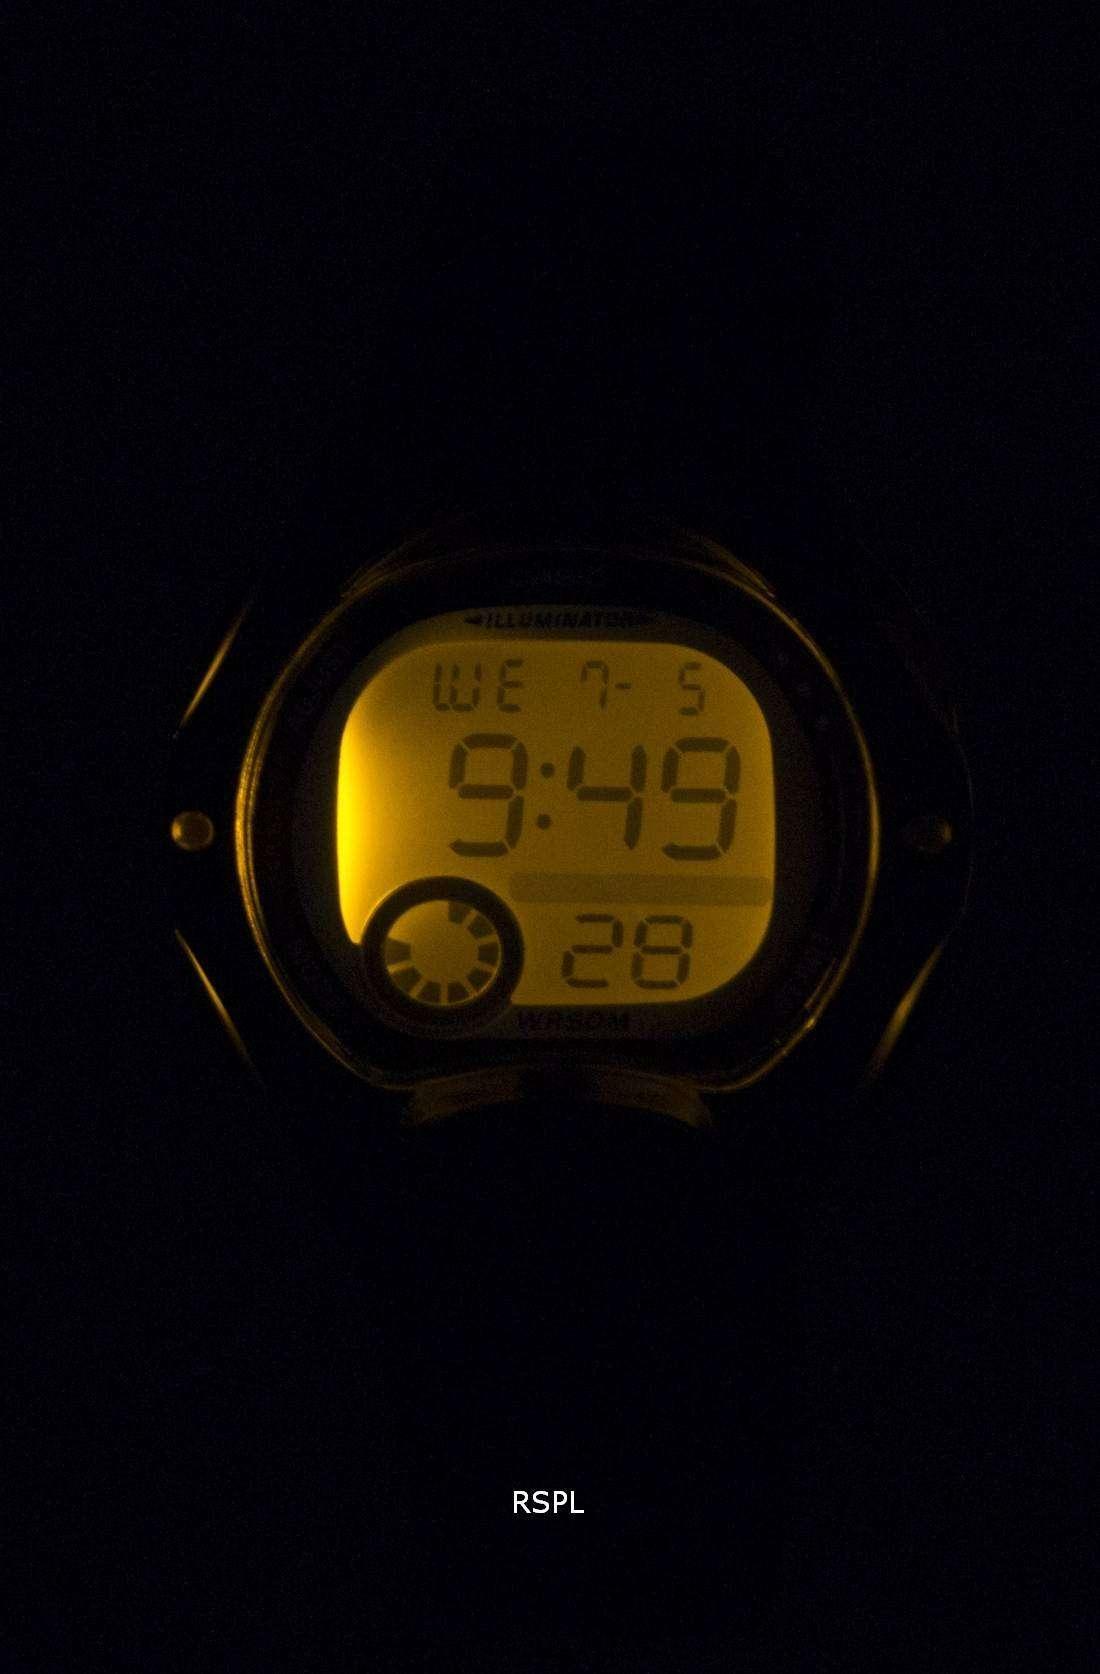 casio illuminator dual time alarm digital lw 200 1bv lw200 1bv women 39 s watch downunderwatches. Black Bedroom Furniture Sets. Home Design Ideas